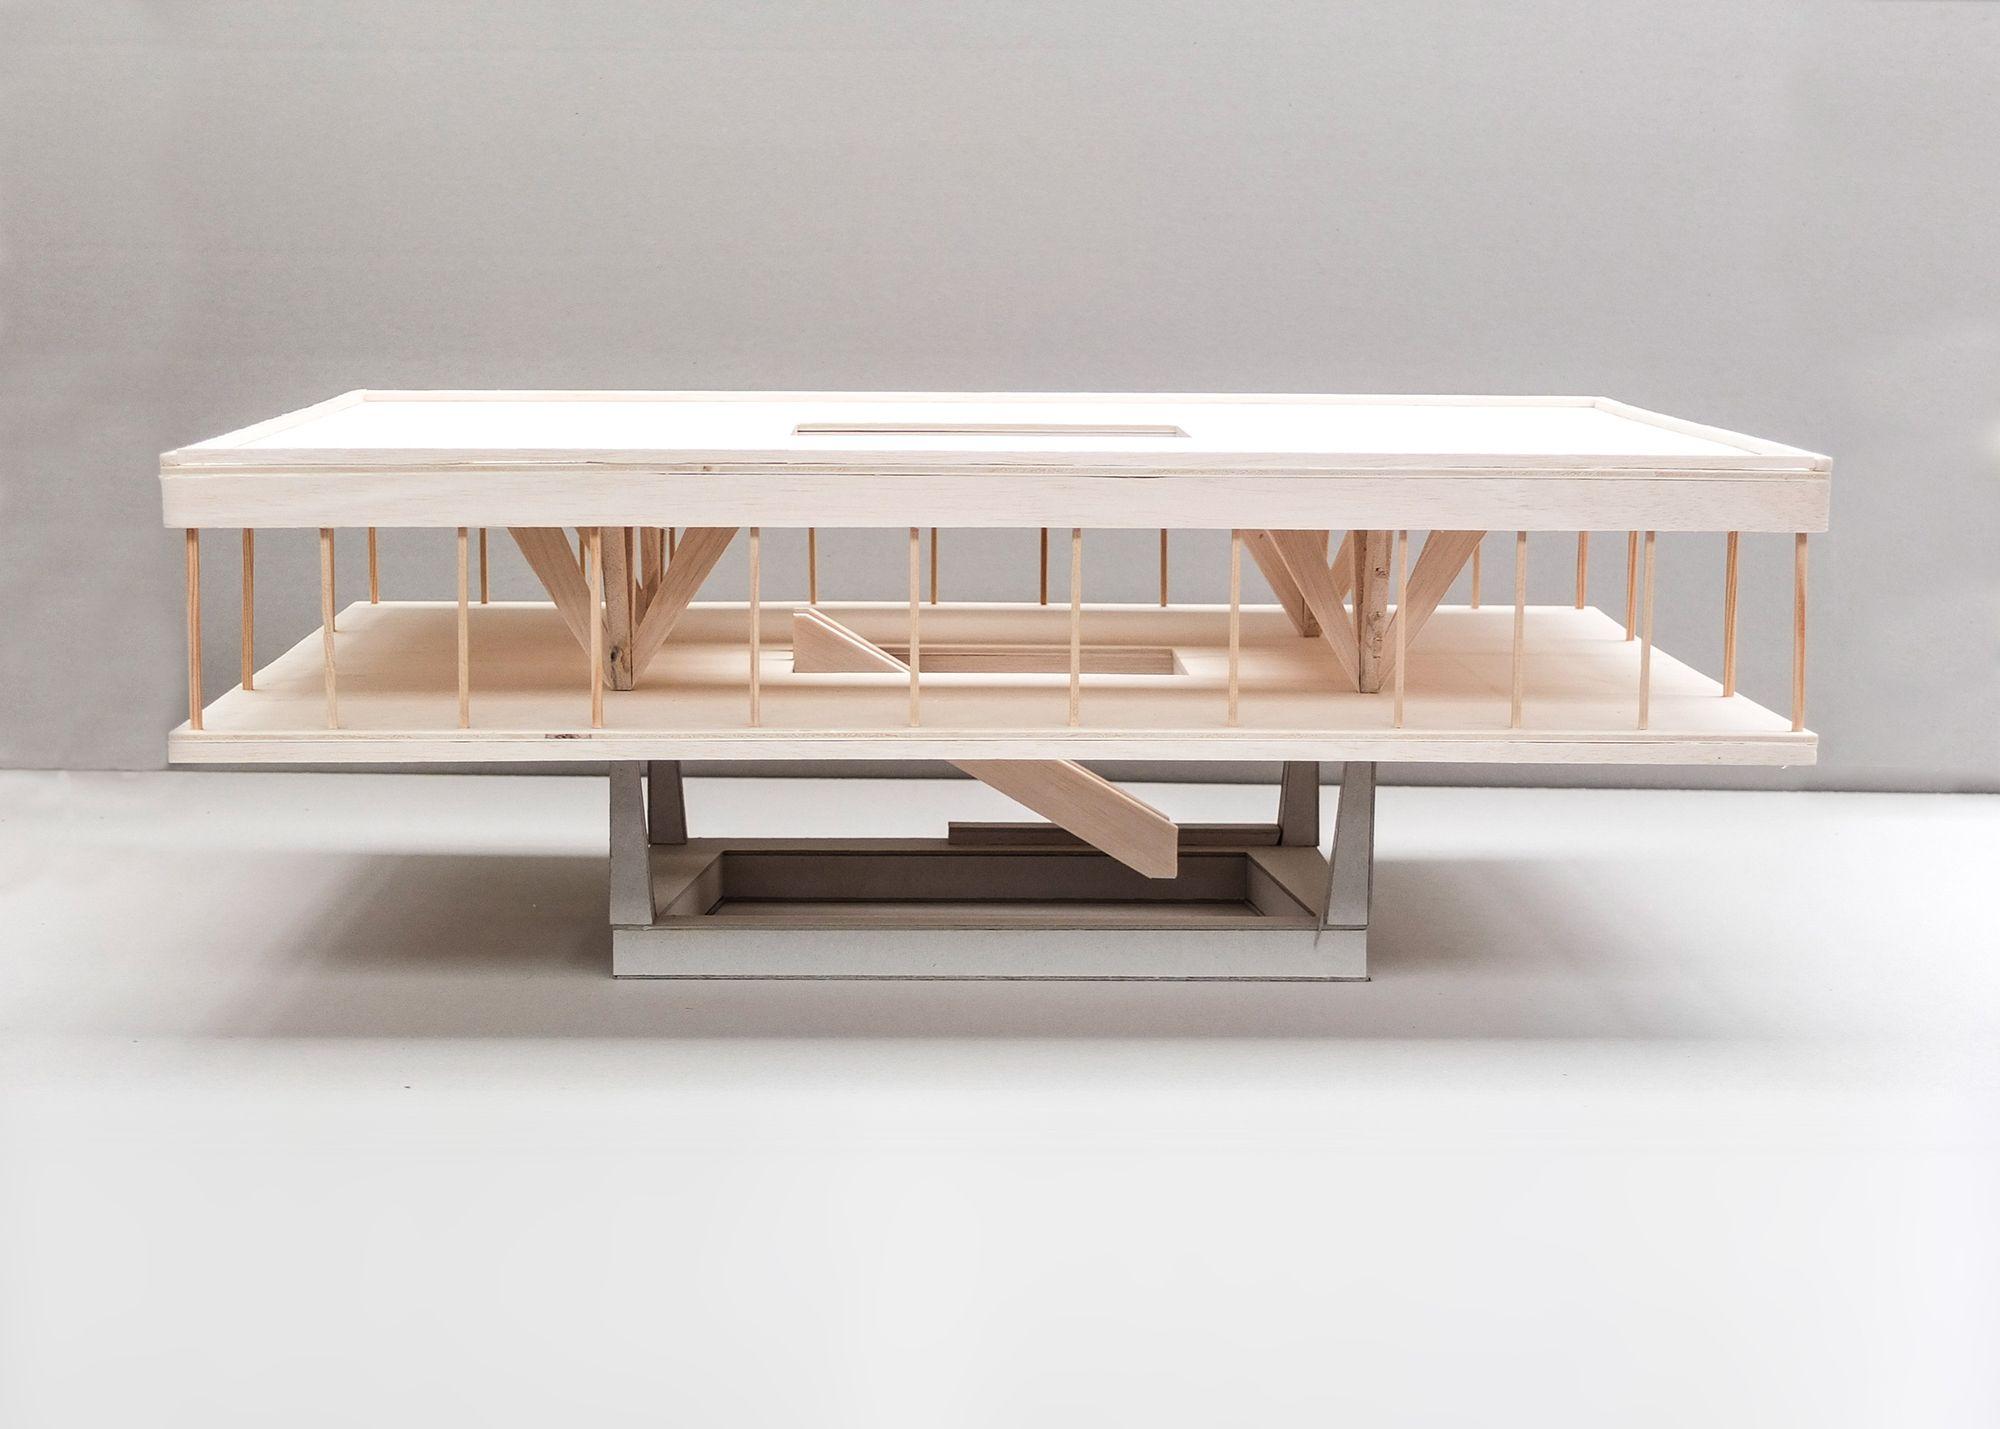 architekturmodell modell pinterest architekturmodell